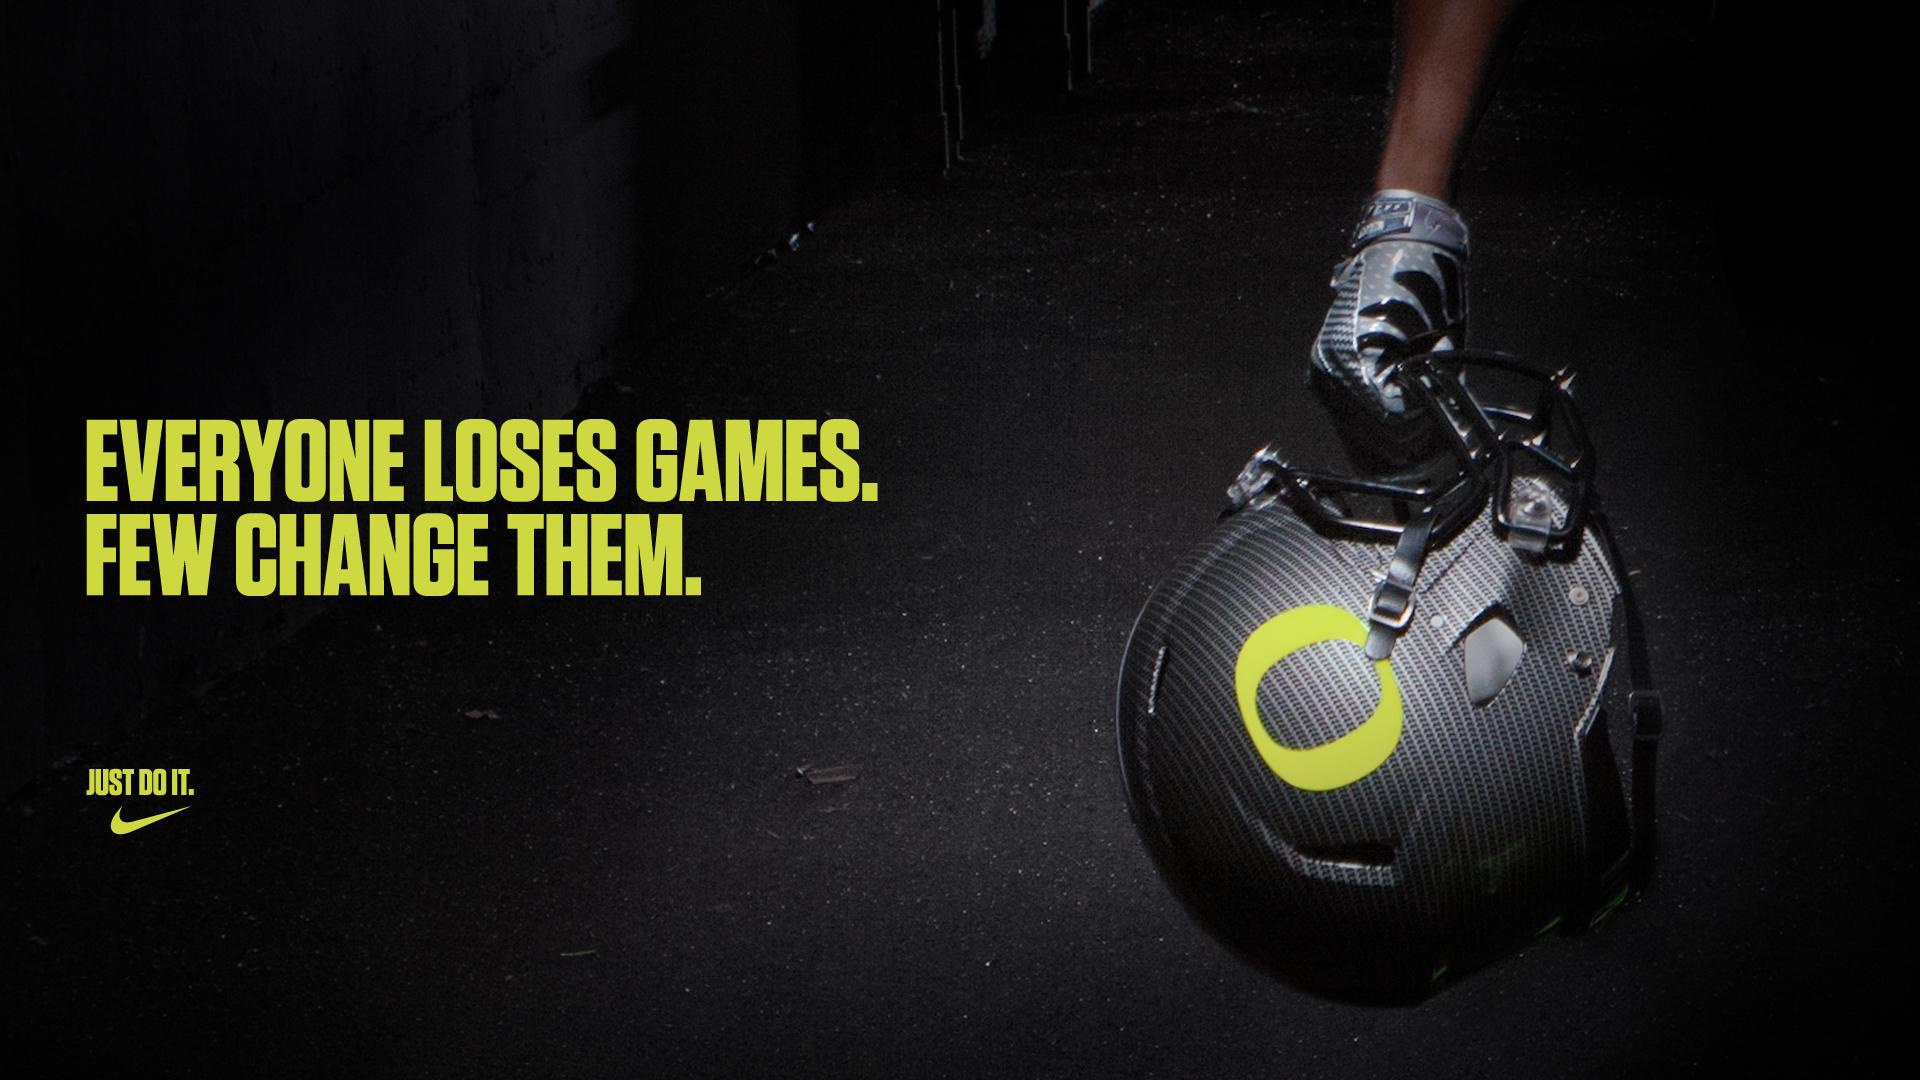 Nike Oregon Football Ad f5   F5toRefresh 1920x1080